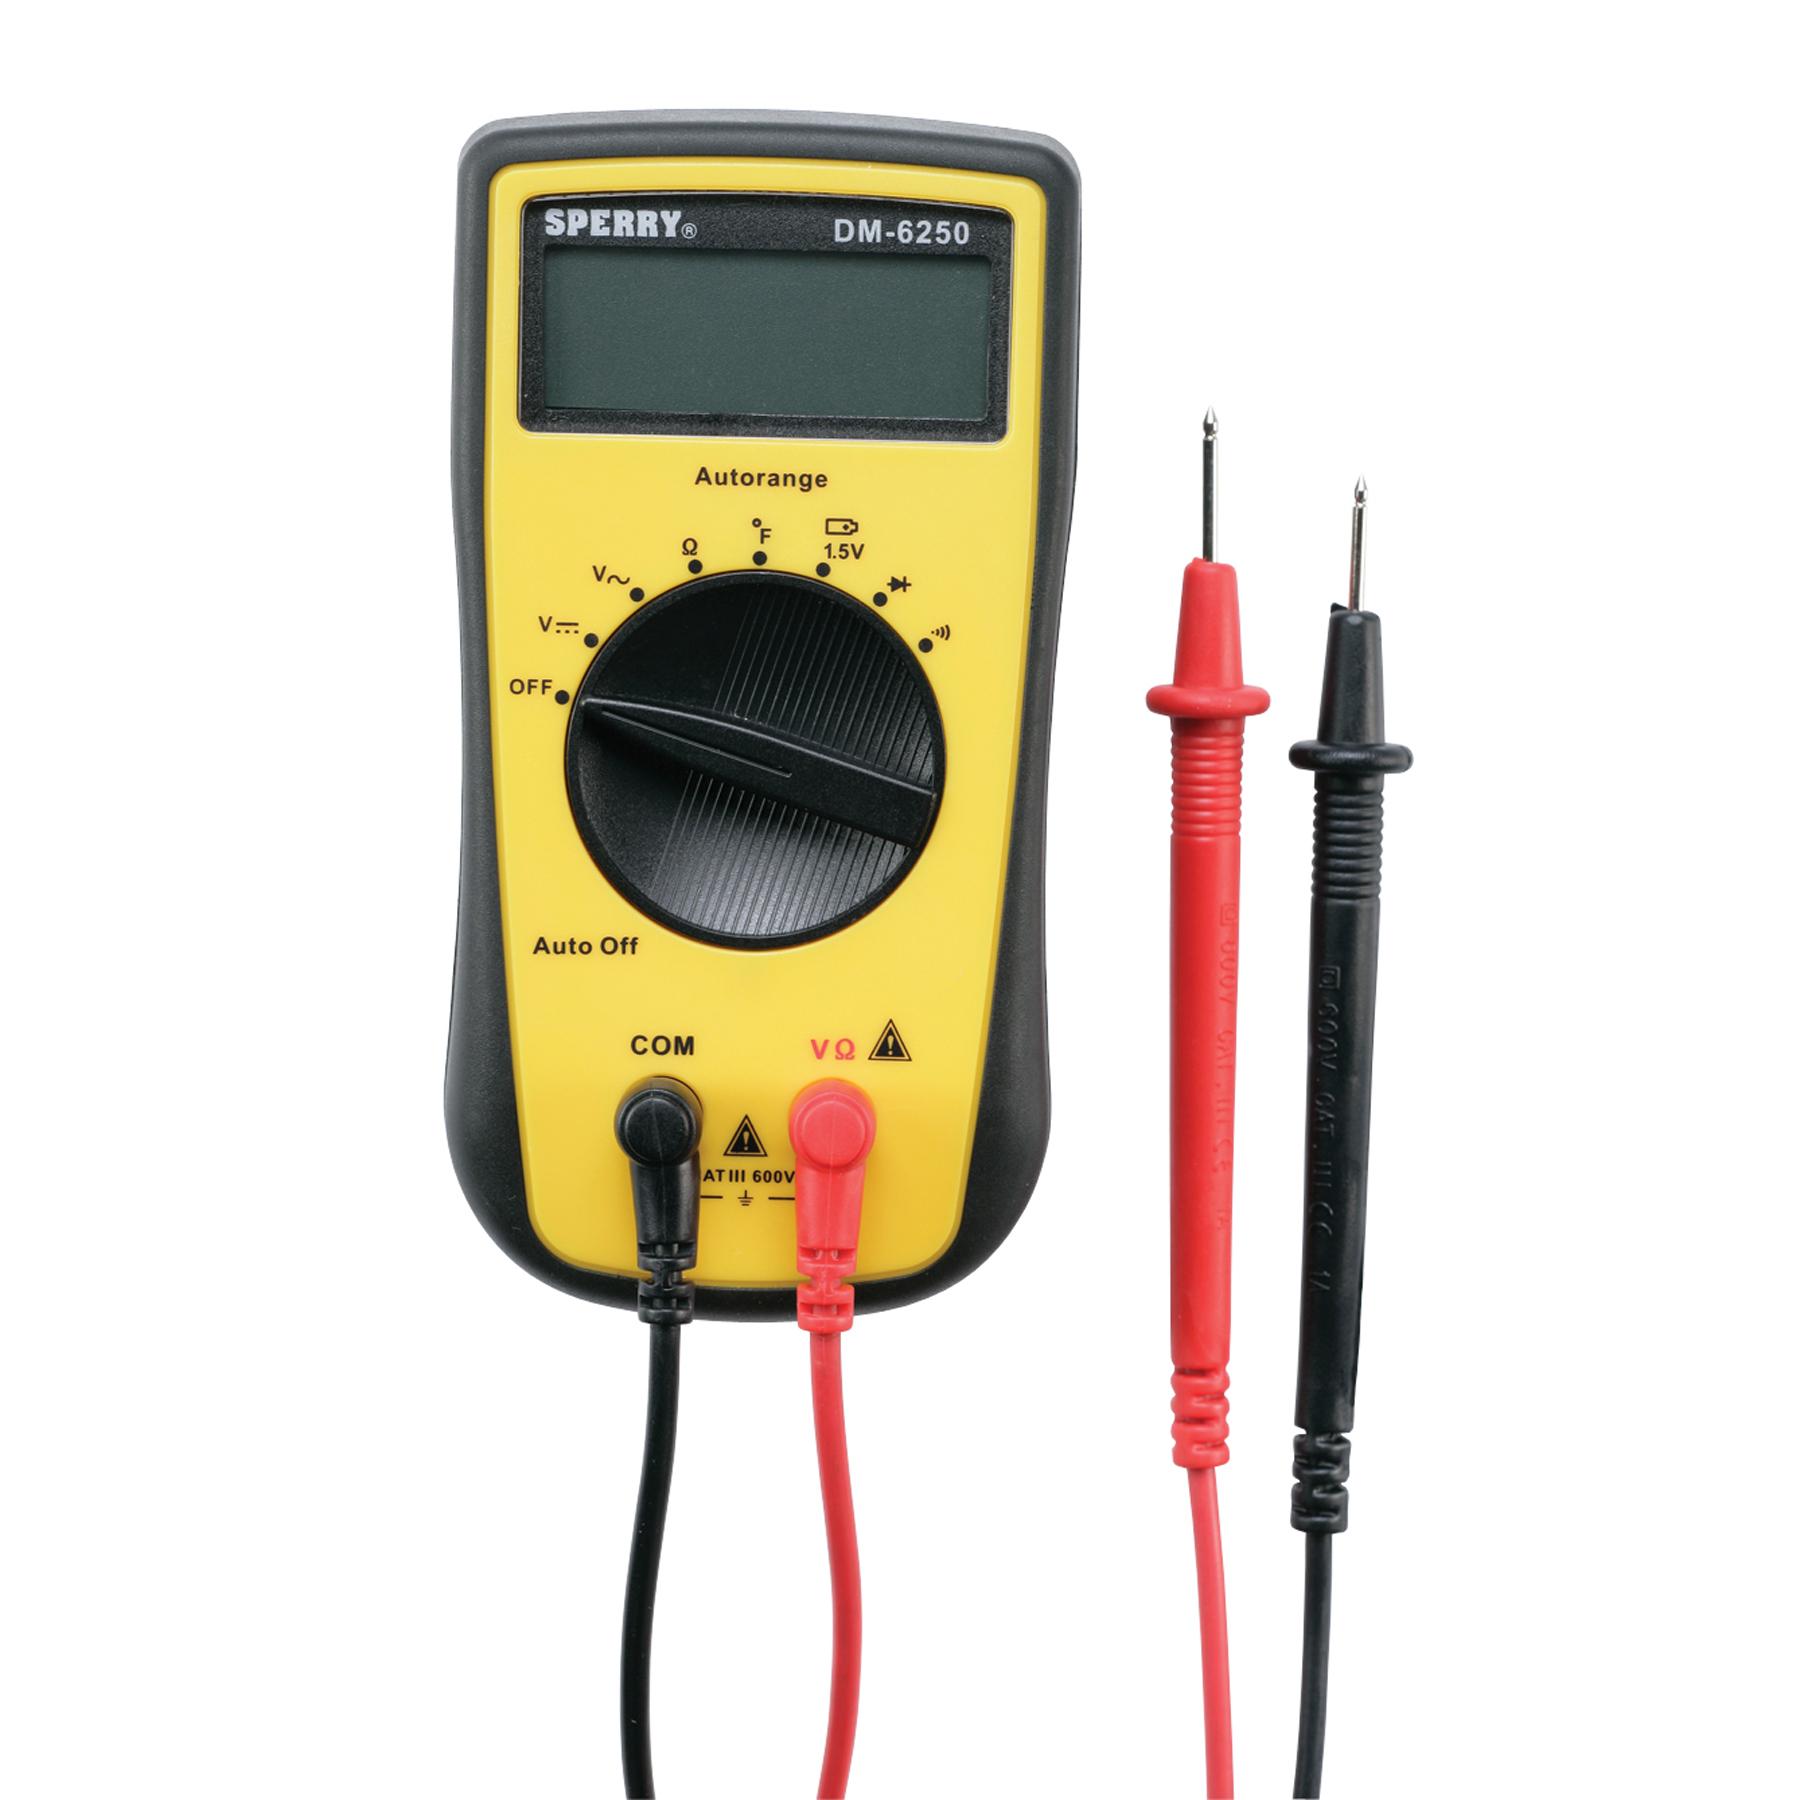 Sperry Instruments DM6250 Digital Multimeter, 7 Function, 19 Auto Range includes AC/DC Voltage, Resistance, Continuity, Diode, Battery, Temp Probe